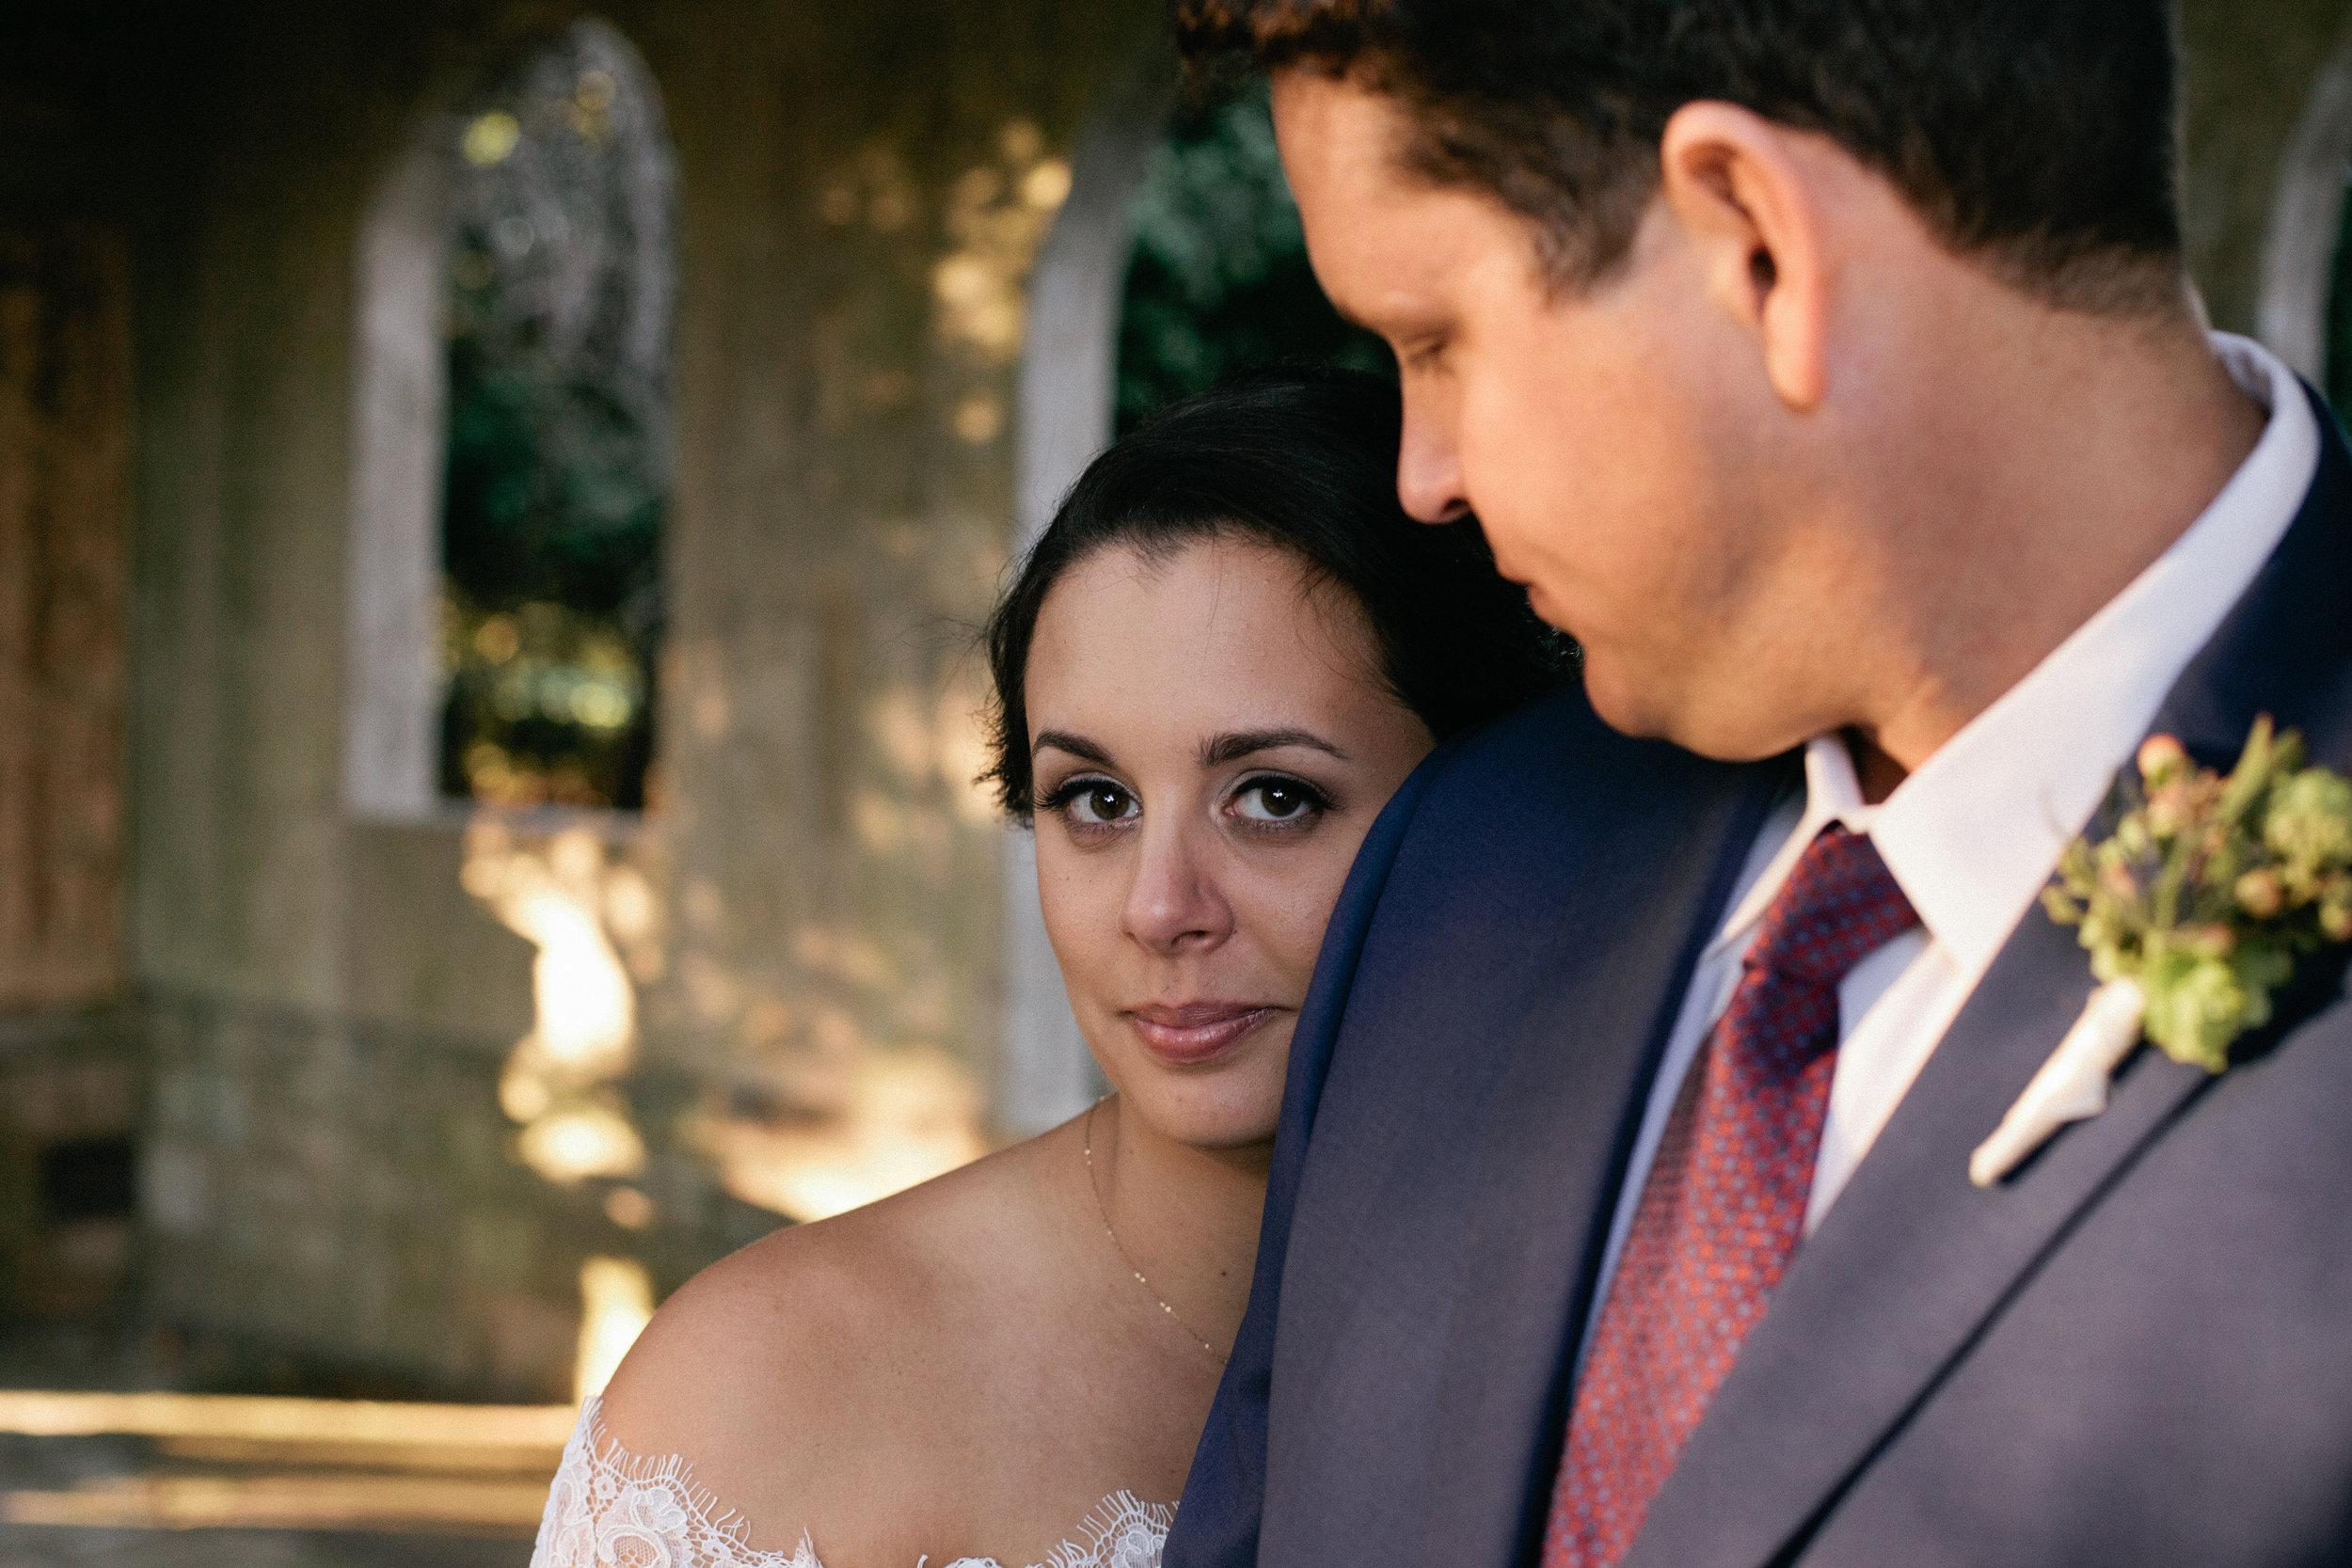 Weddings-Richmond-Couple.jpg